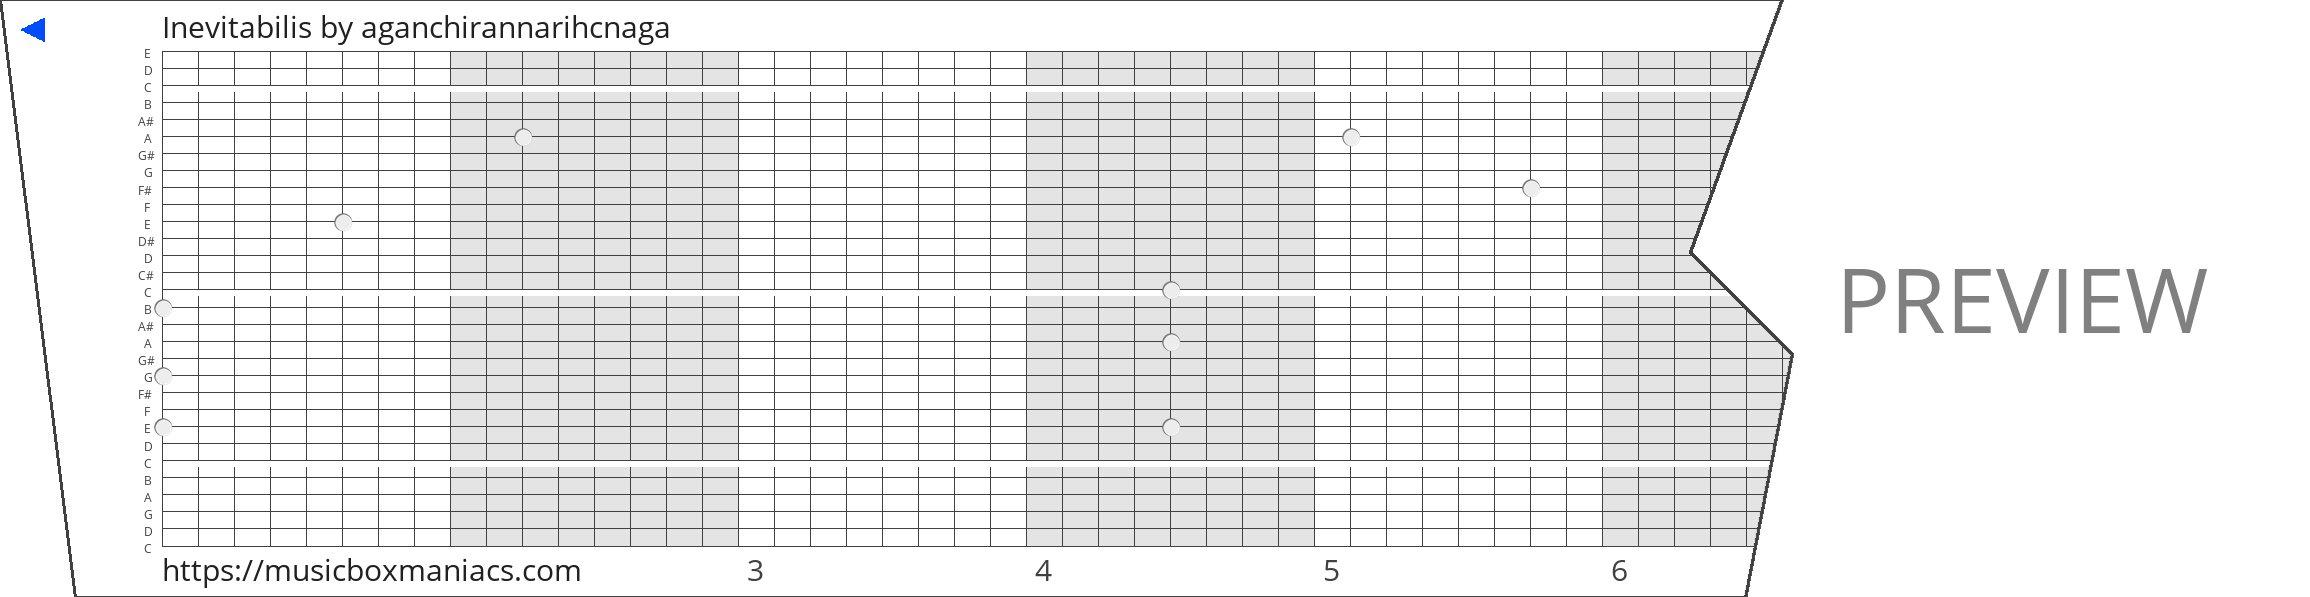 Inevitabilis 30 note music box paper strip